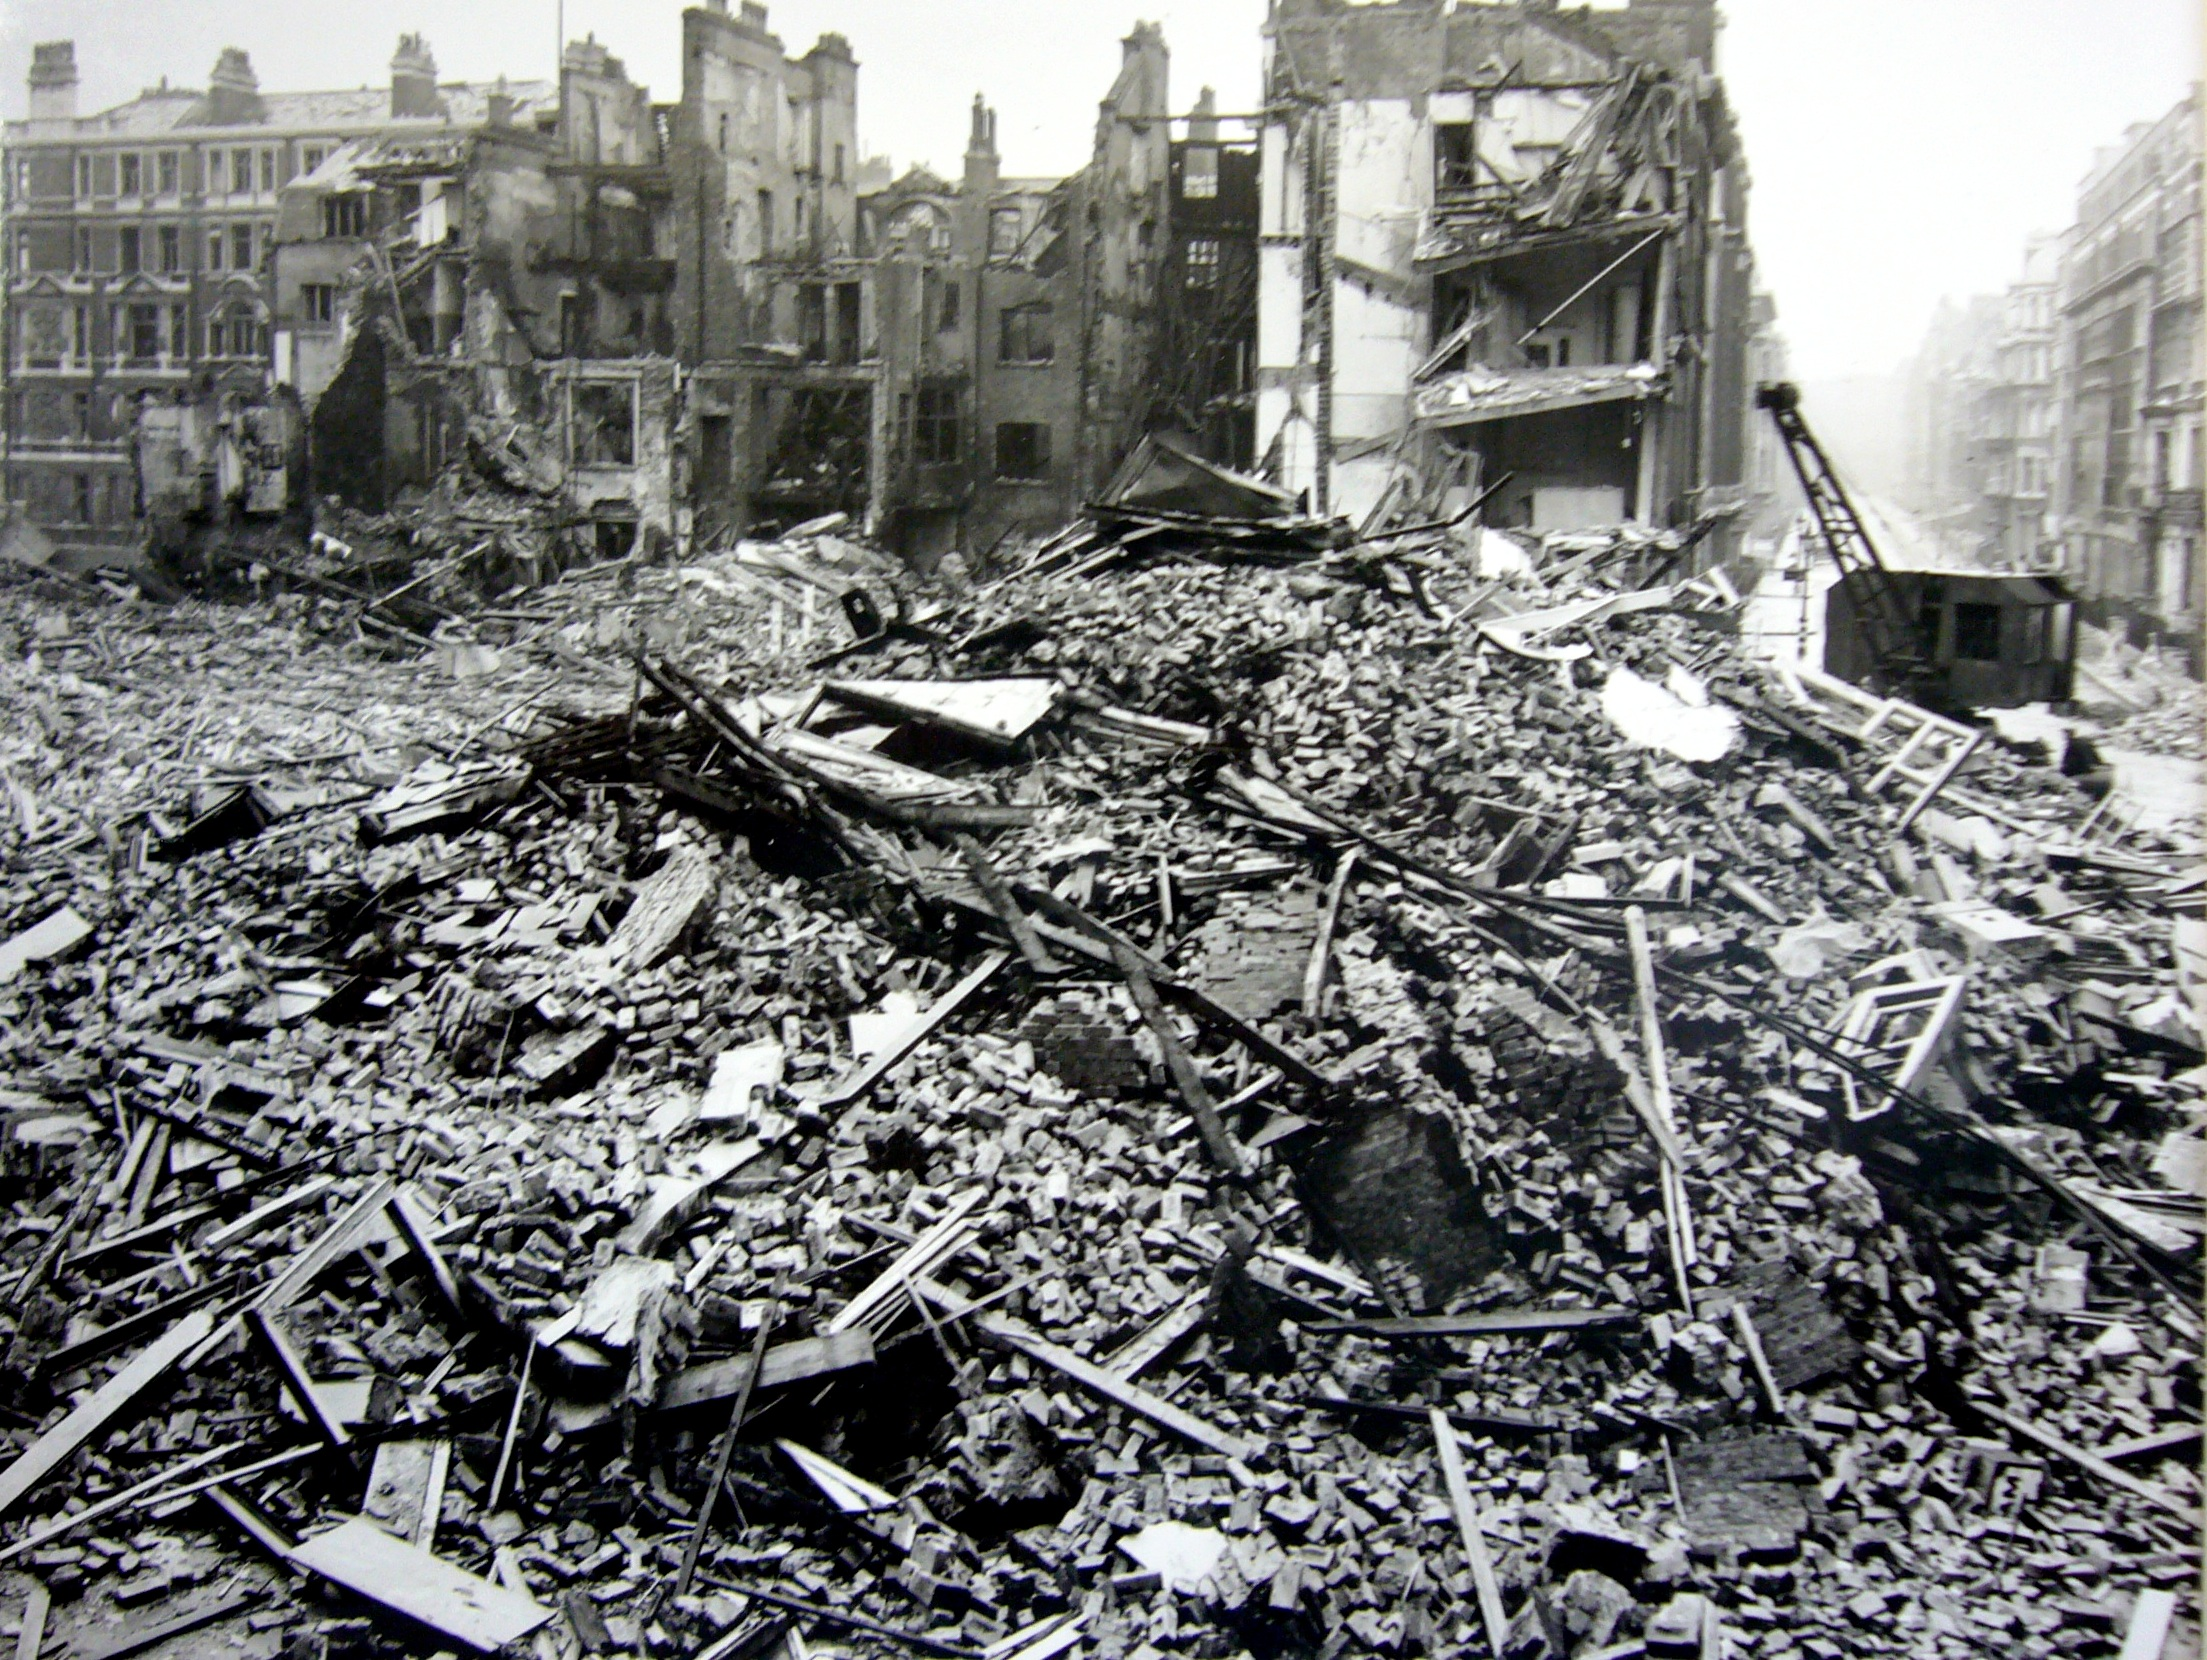 1940 St Katharine Docks, and the Tower of London raid (Hitler's World)